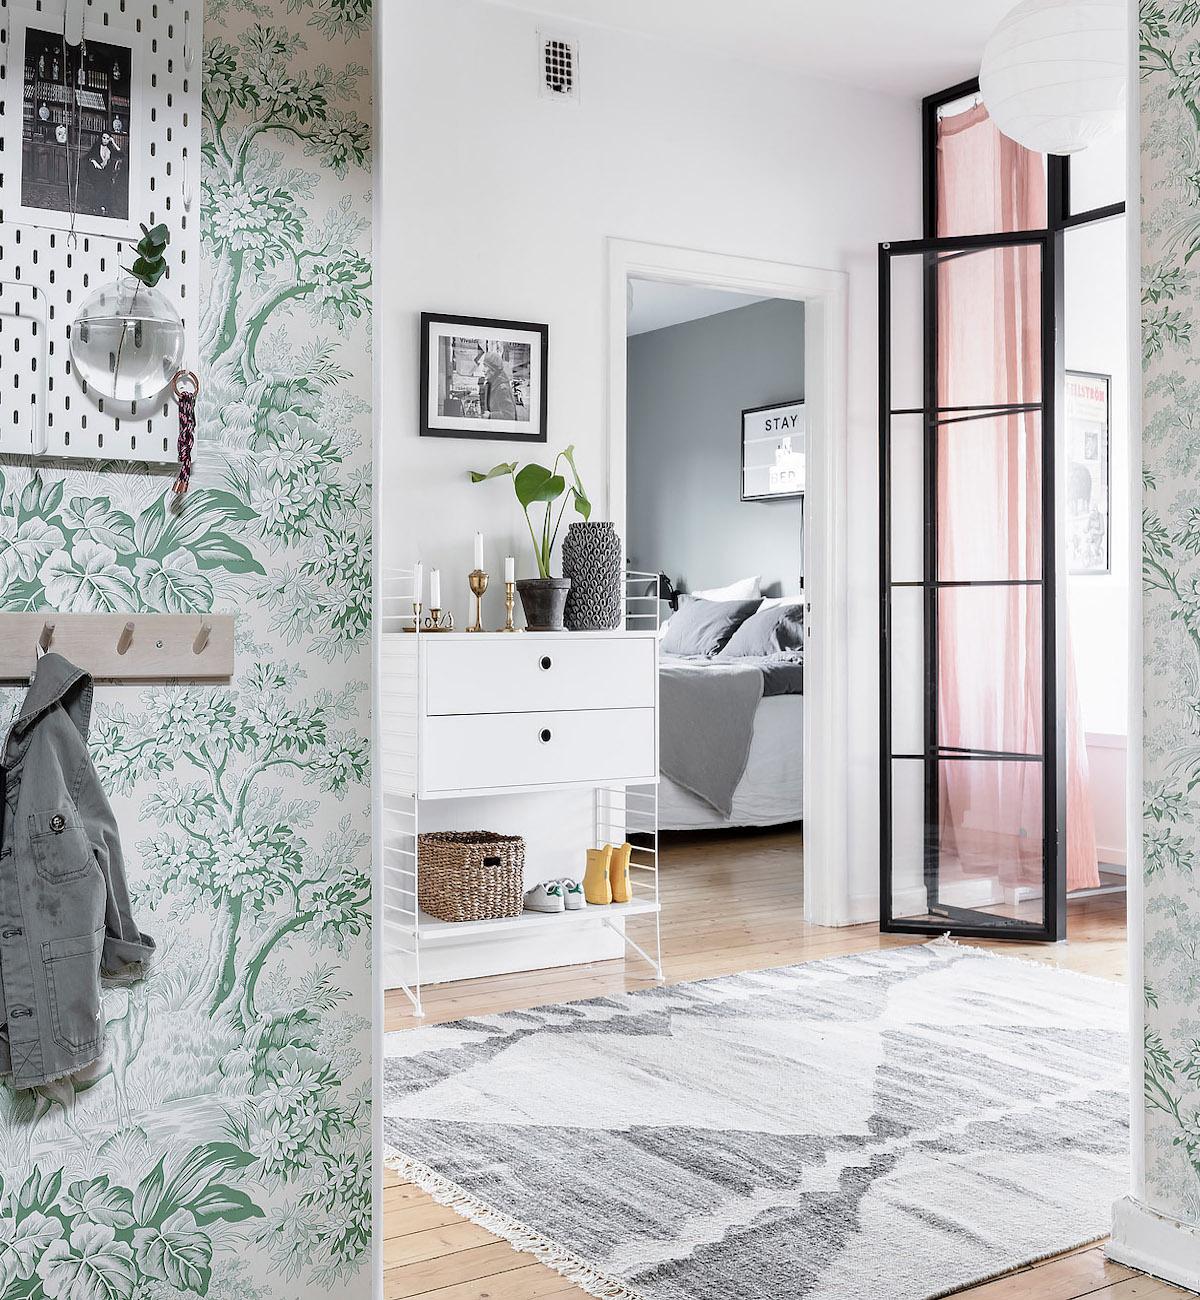 papier peint vert vintage hall printanier meuble tapis gris - blog déco - clem around the corner